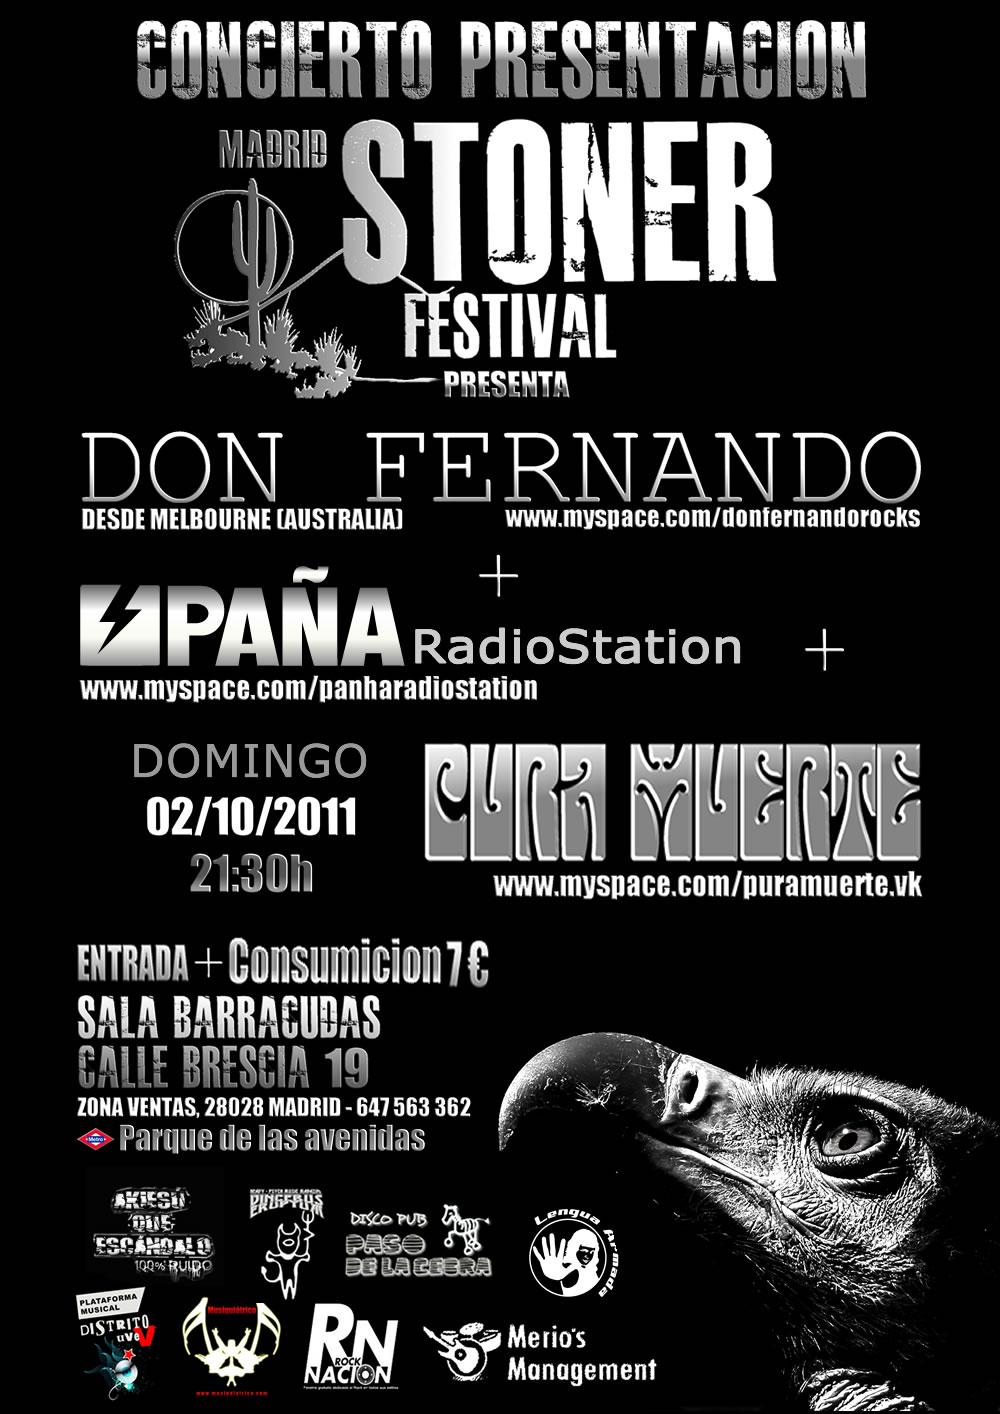 Ver Cartel a tamaño completo: Madrid Stoner Festival 2012